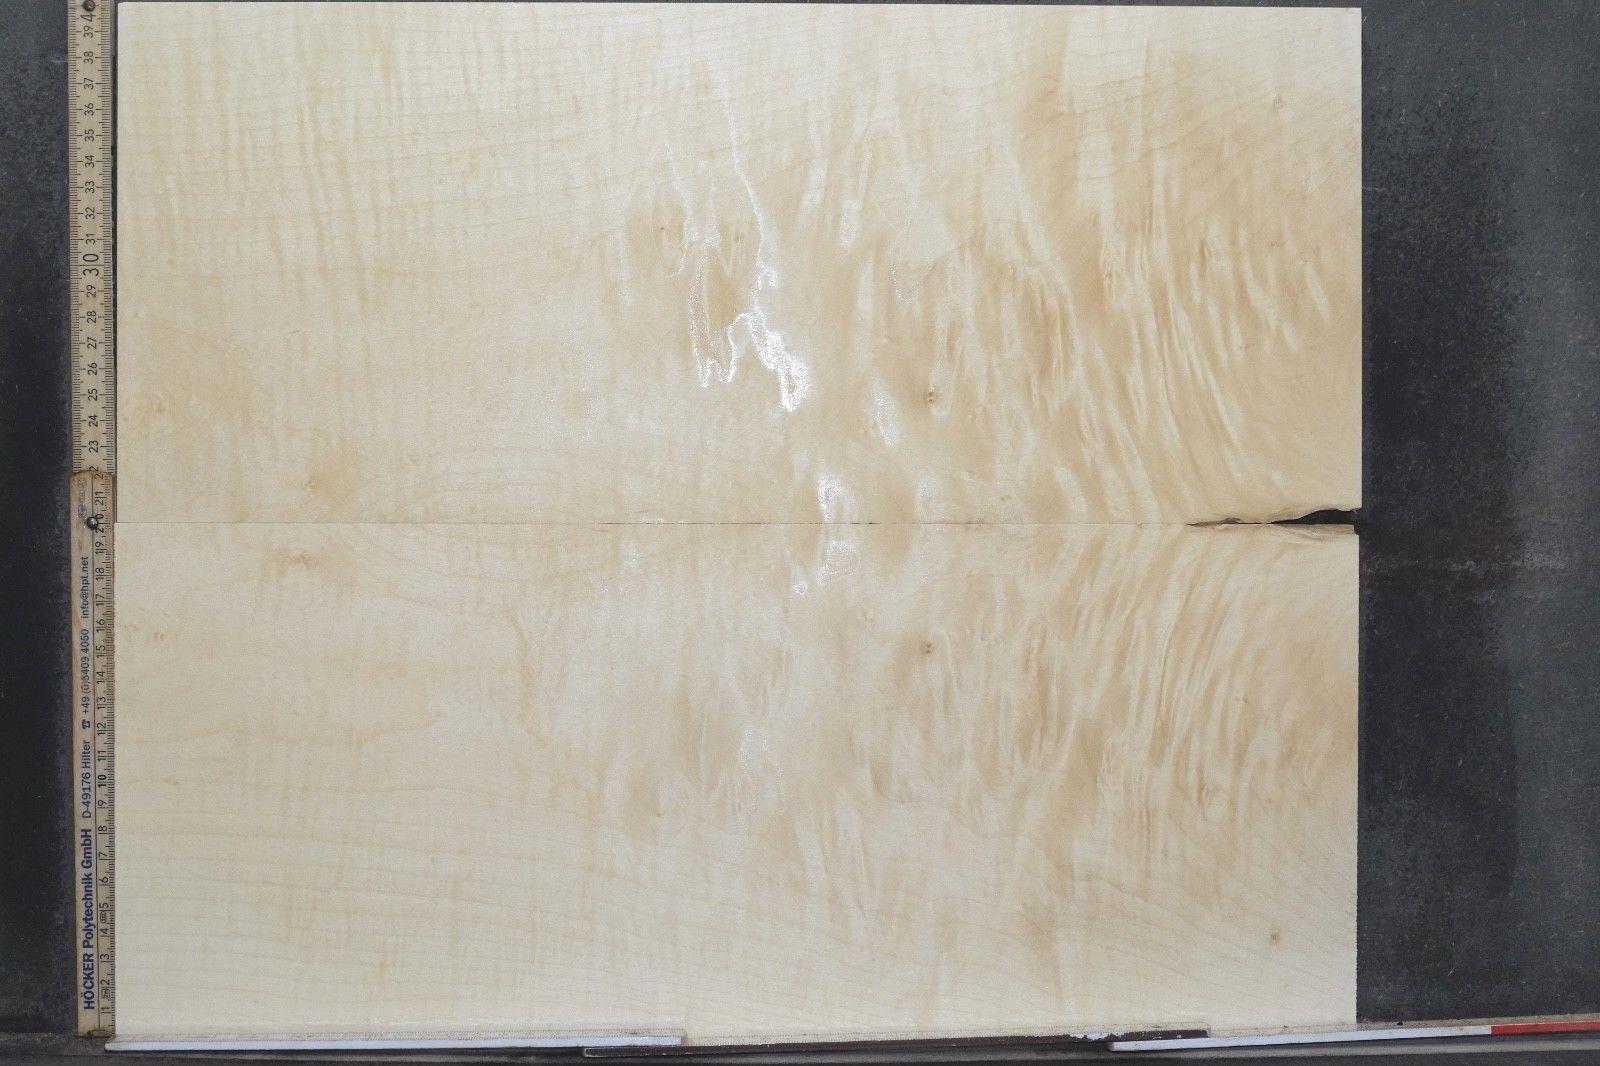 Tonewood Riegel Ahorn Flamed Maple 11,2 mm Aufleimer Guitar Tonholz Droptop 295